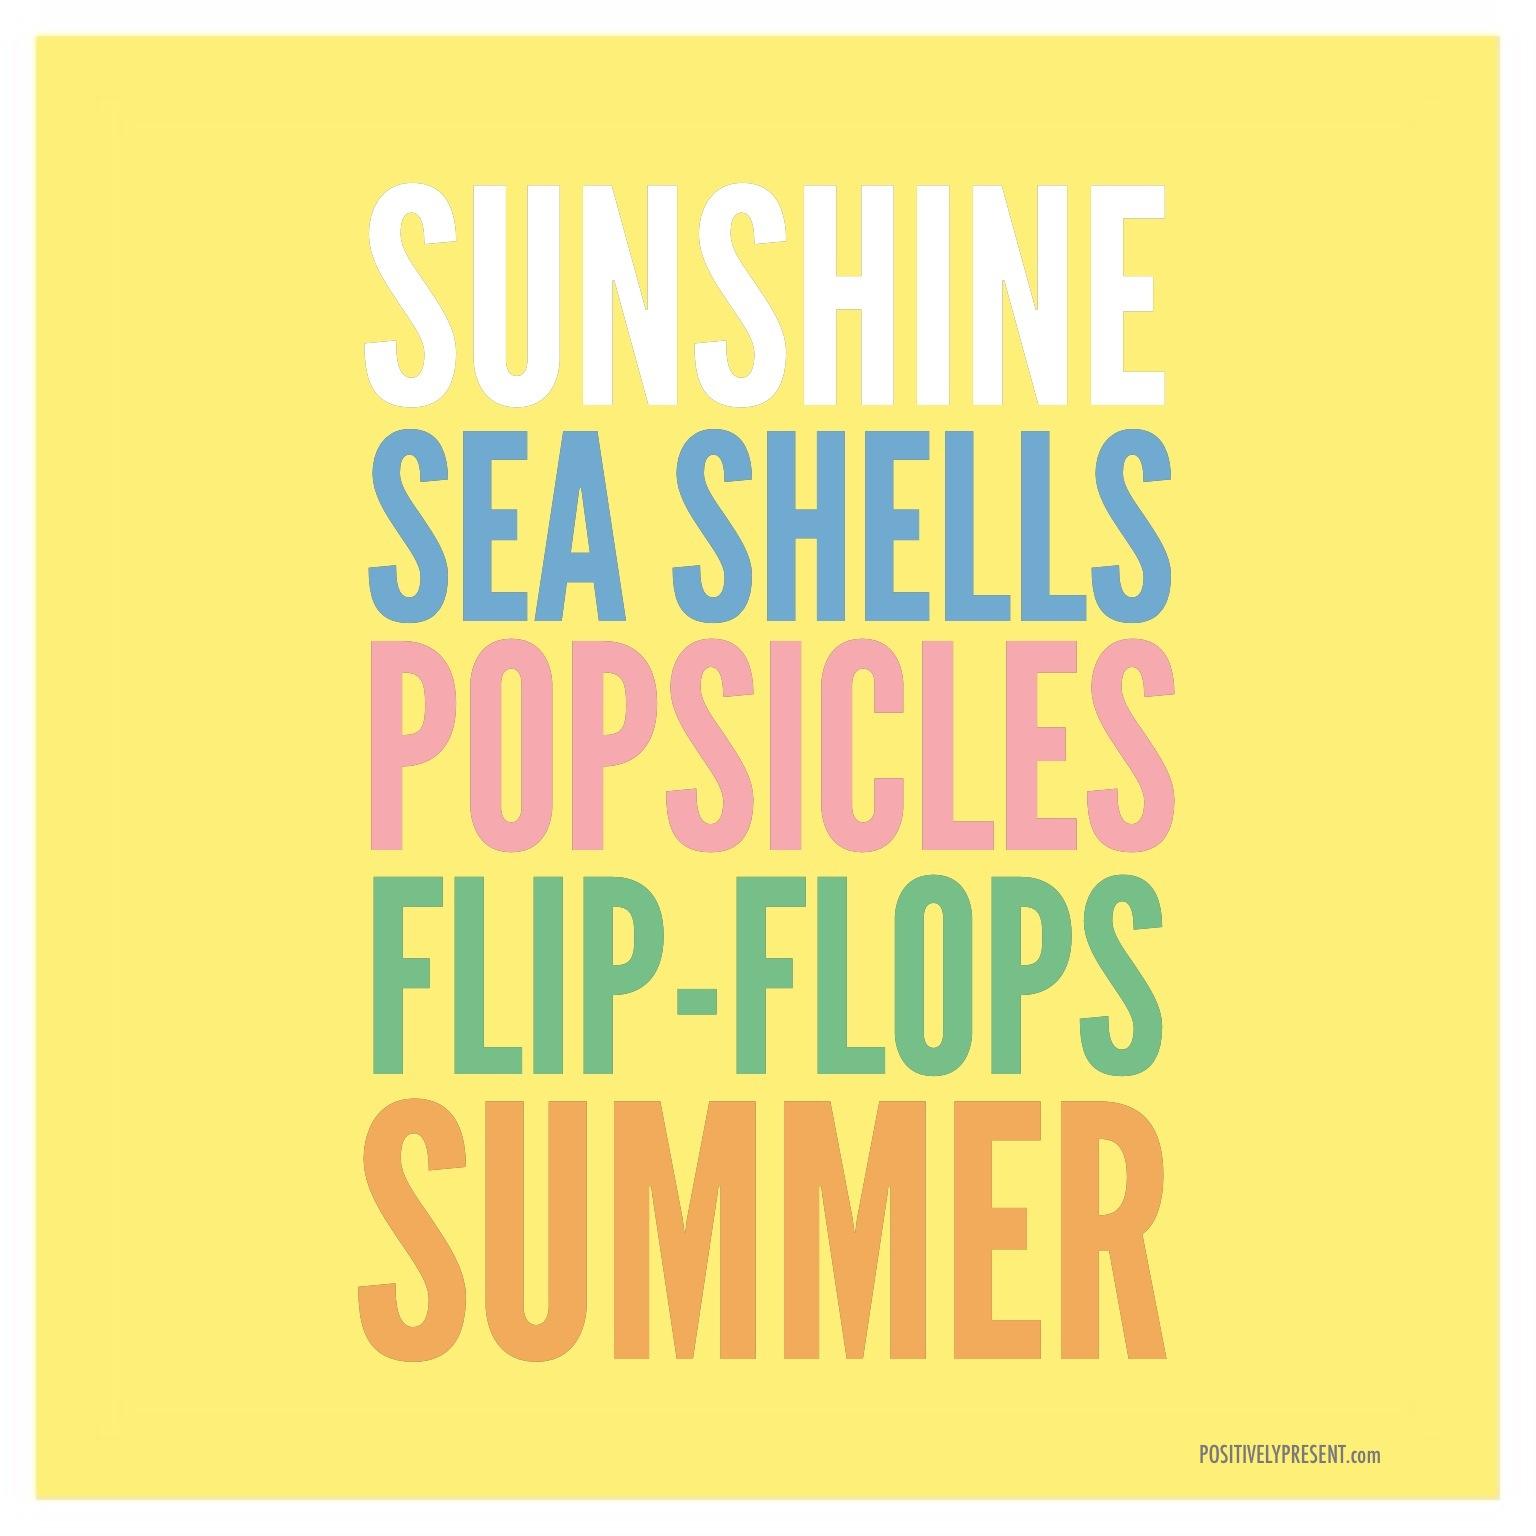 Summer Flip Flop Quotes Image 20